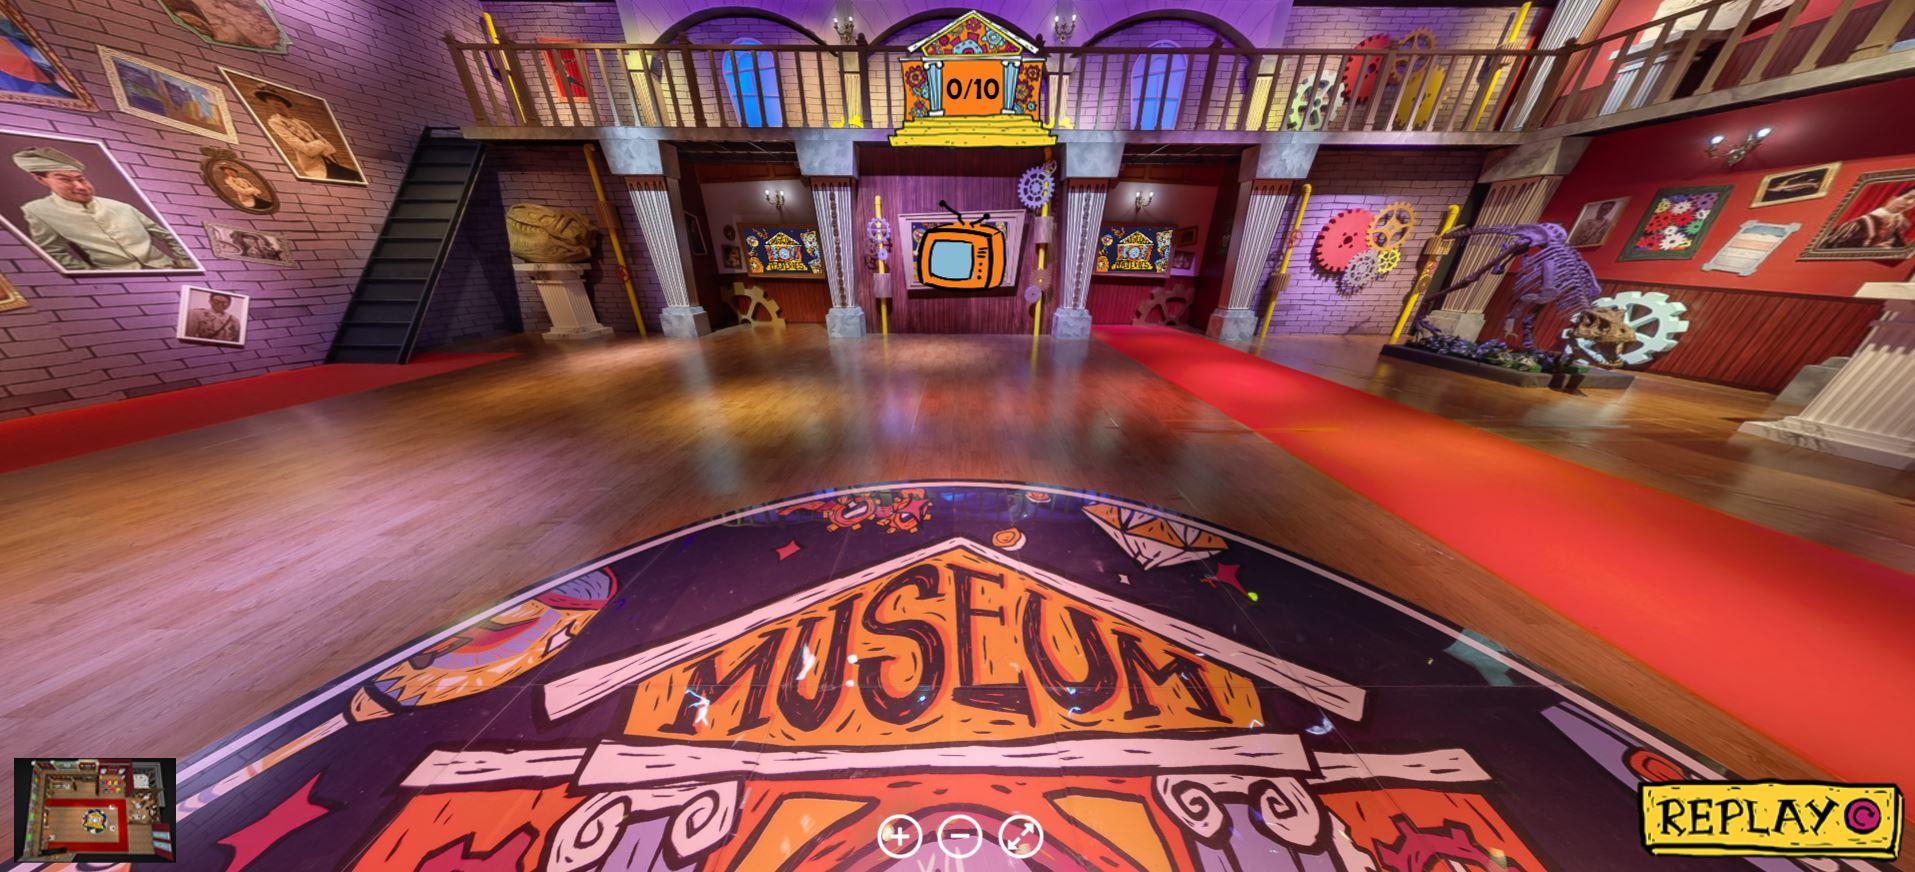 Museum Mysteries 5